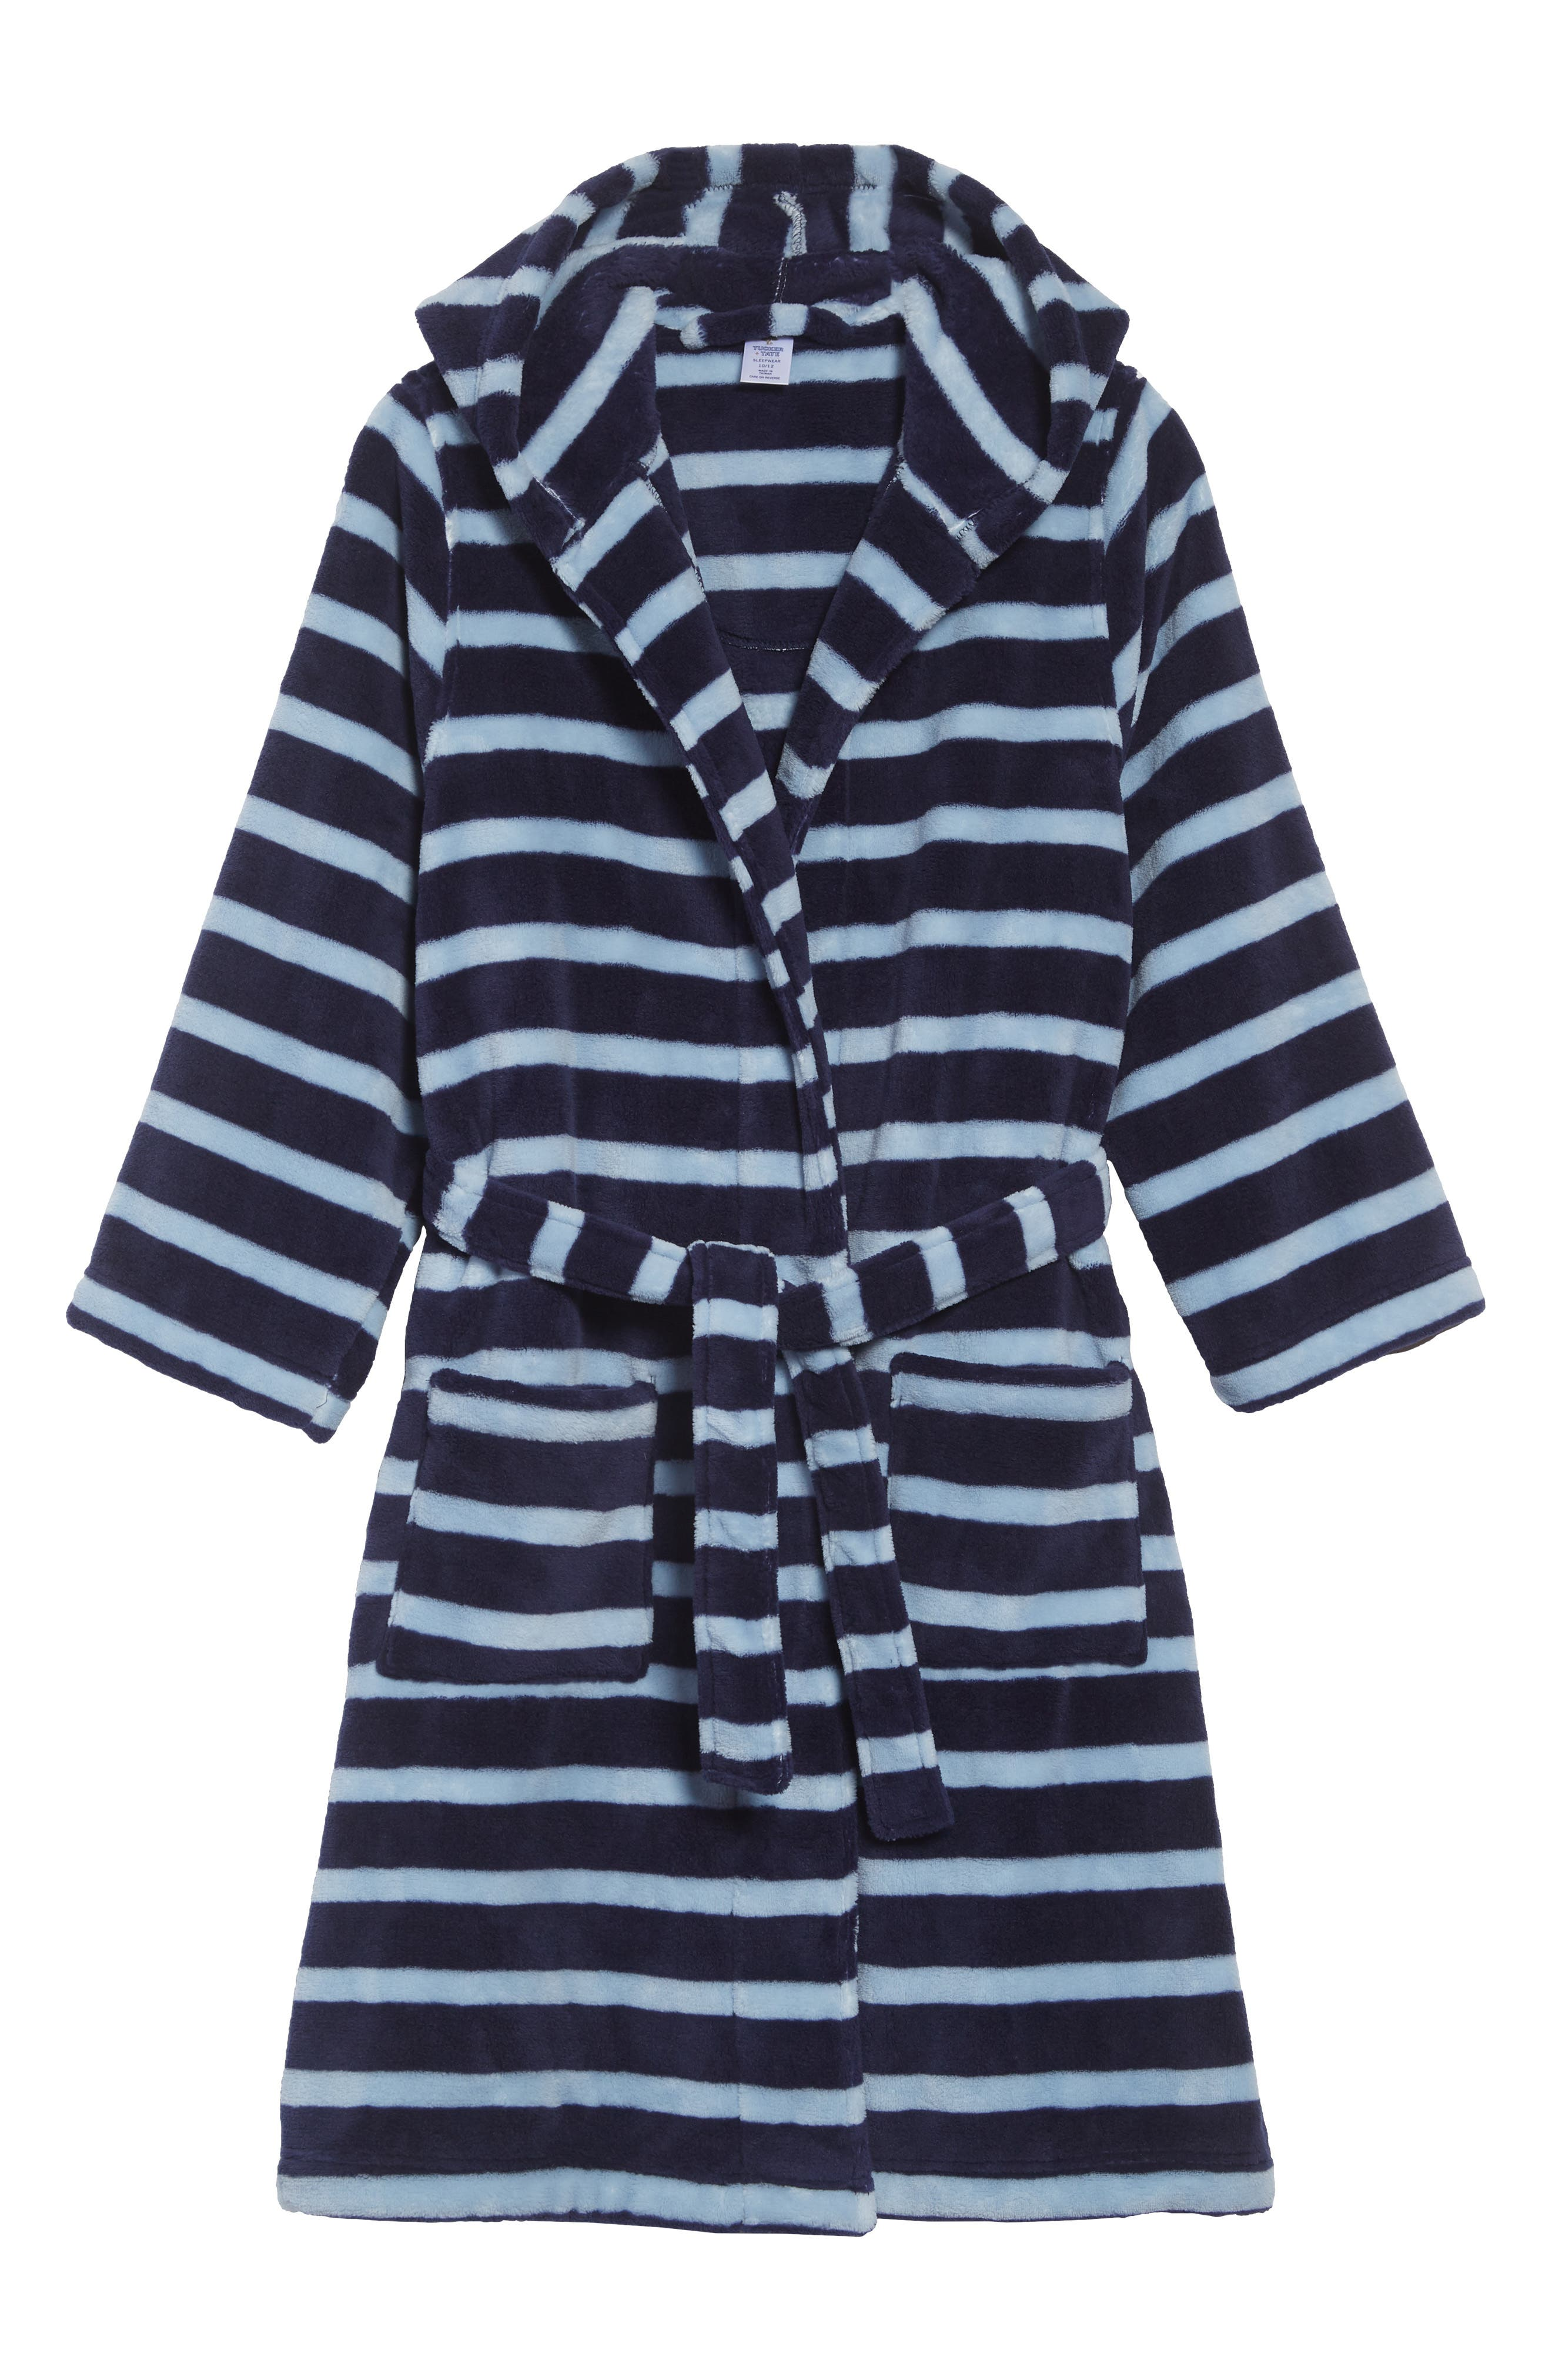 TUCKER + TATE, Hooded Plush Robe, Main thumbnail 1, color, 410